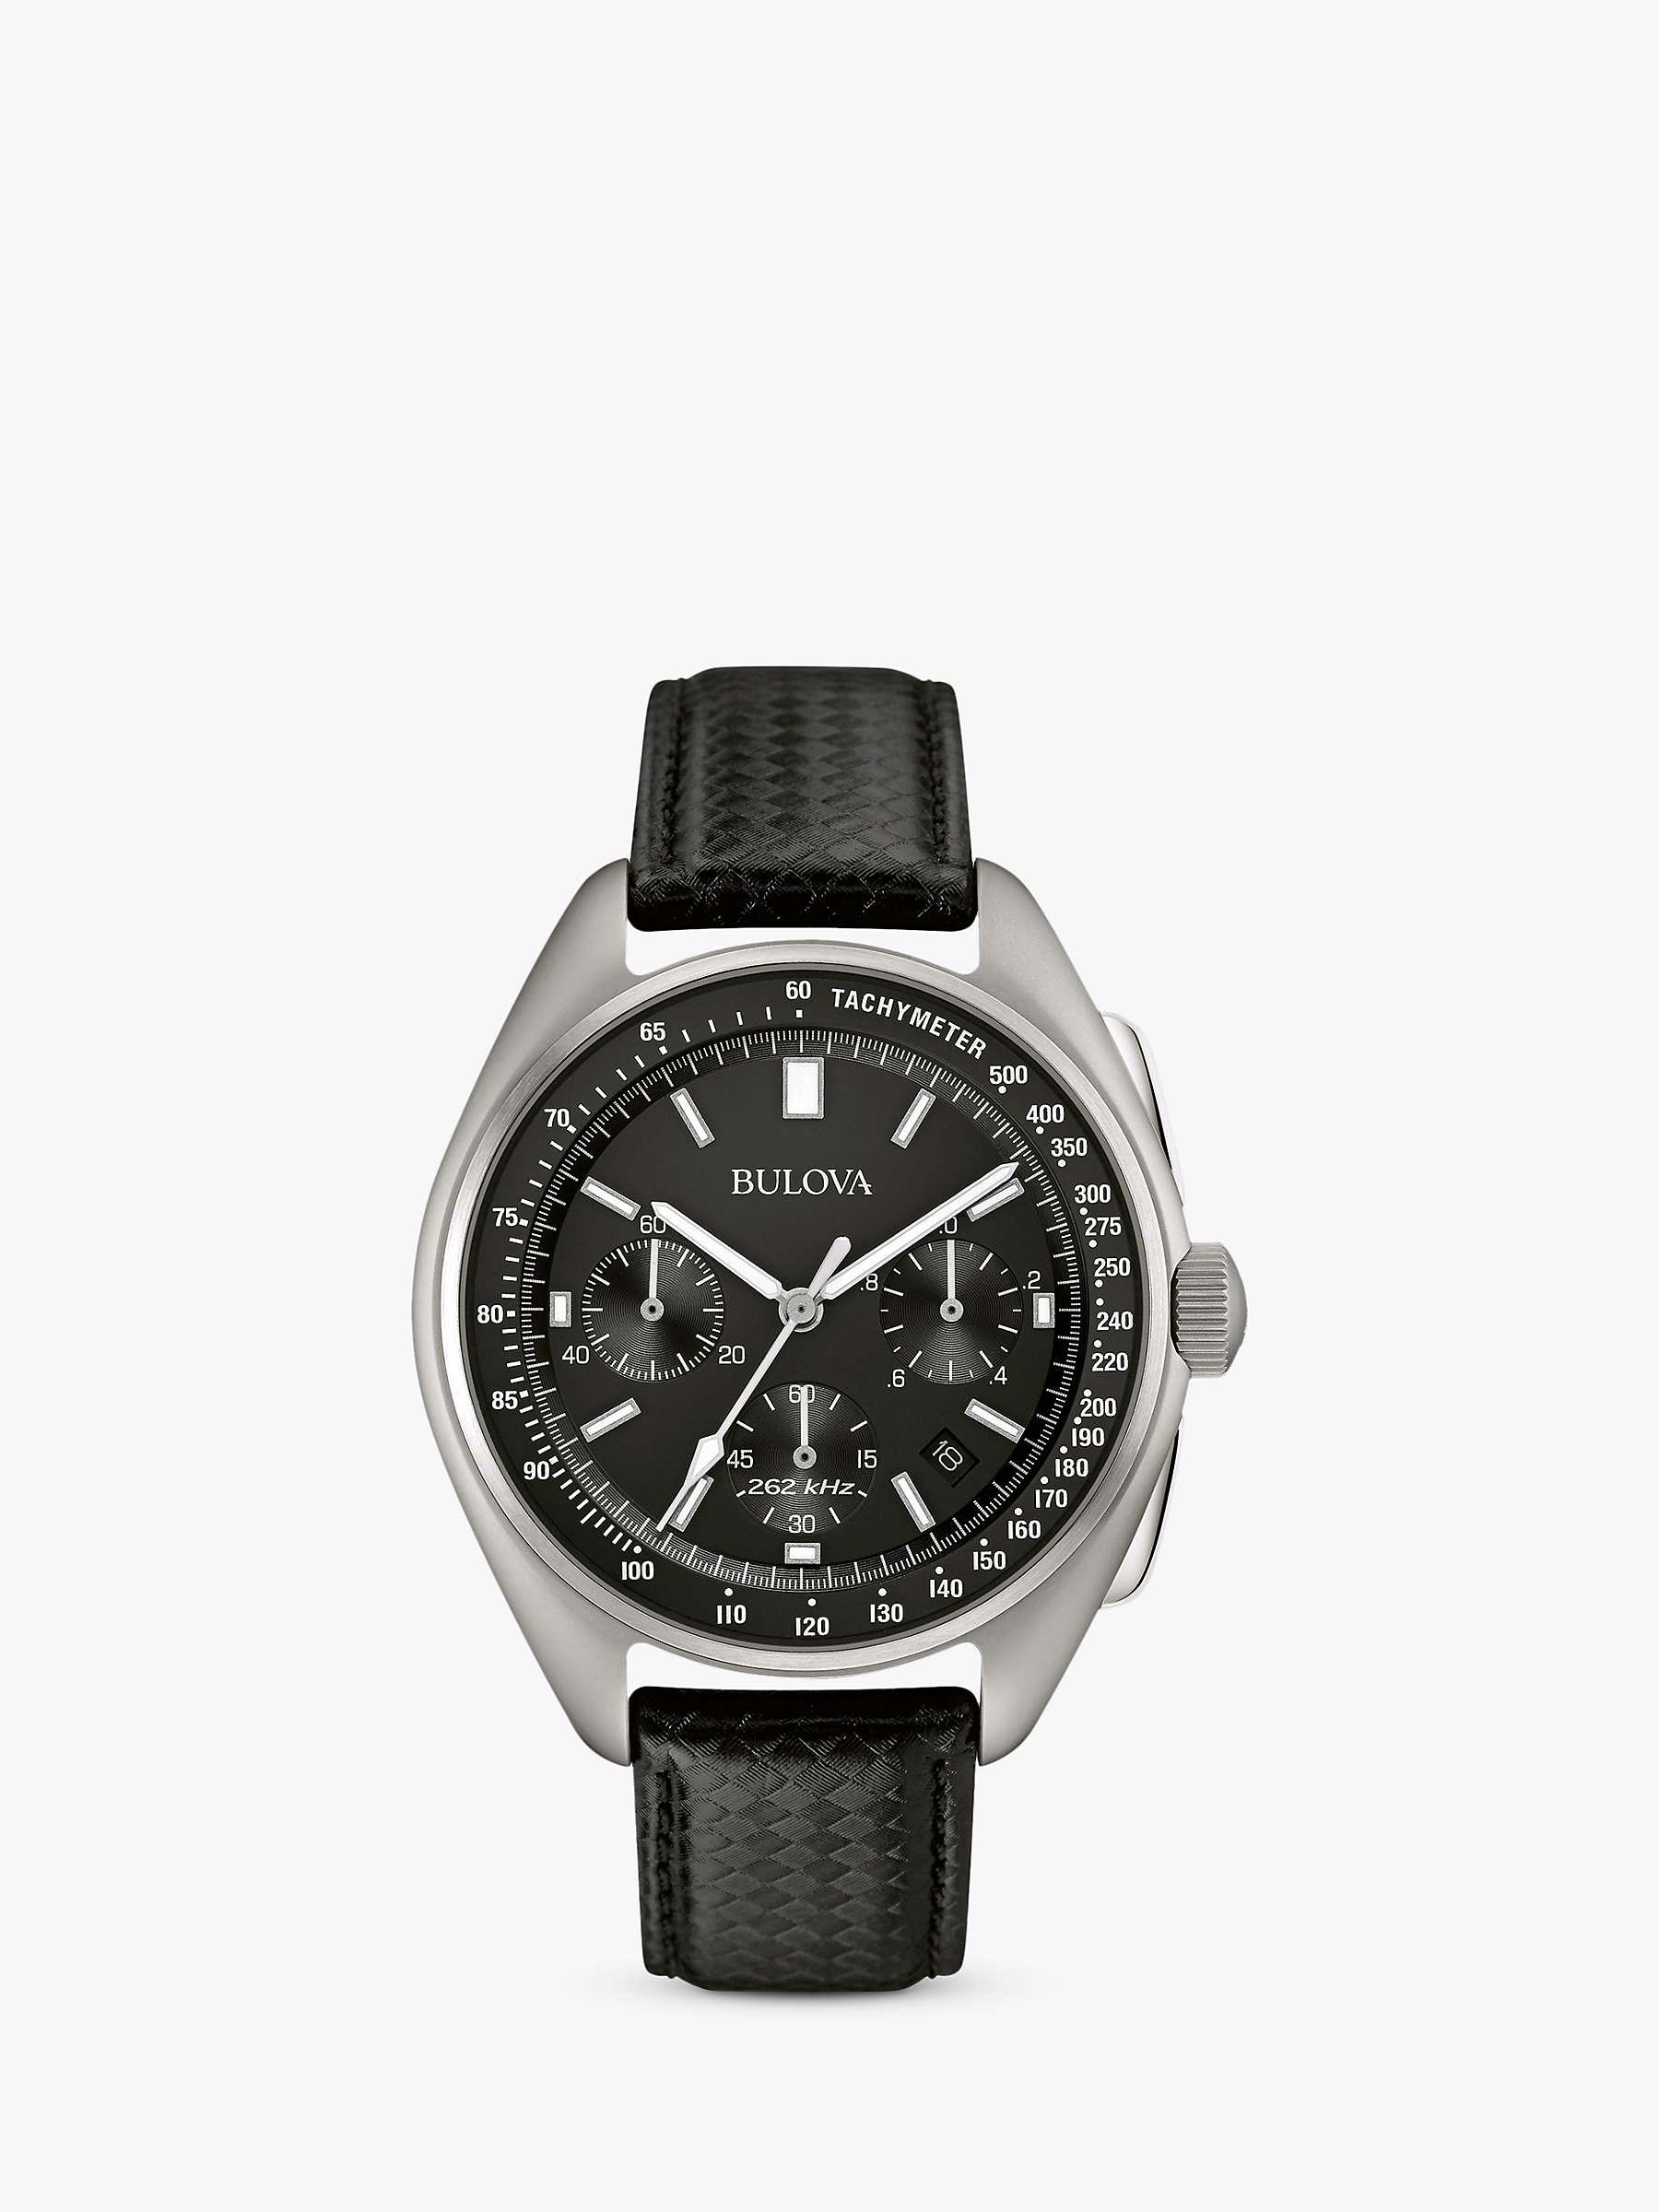 Bulova Moon Watch (96B251) Special Edition Moon Apollo 15